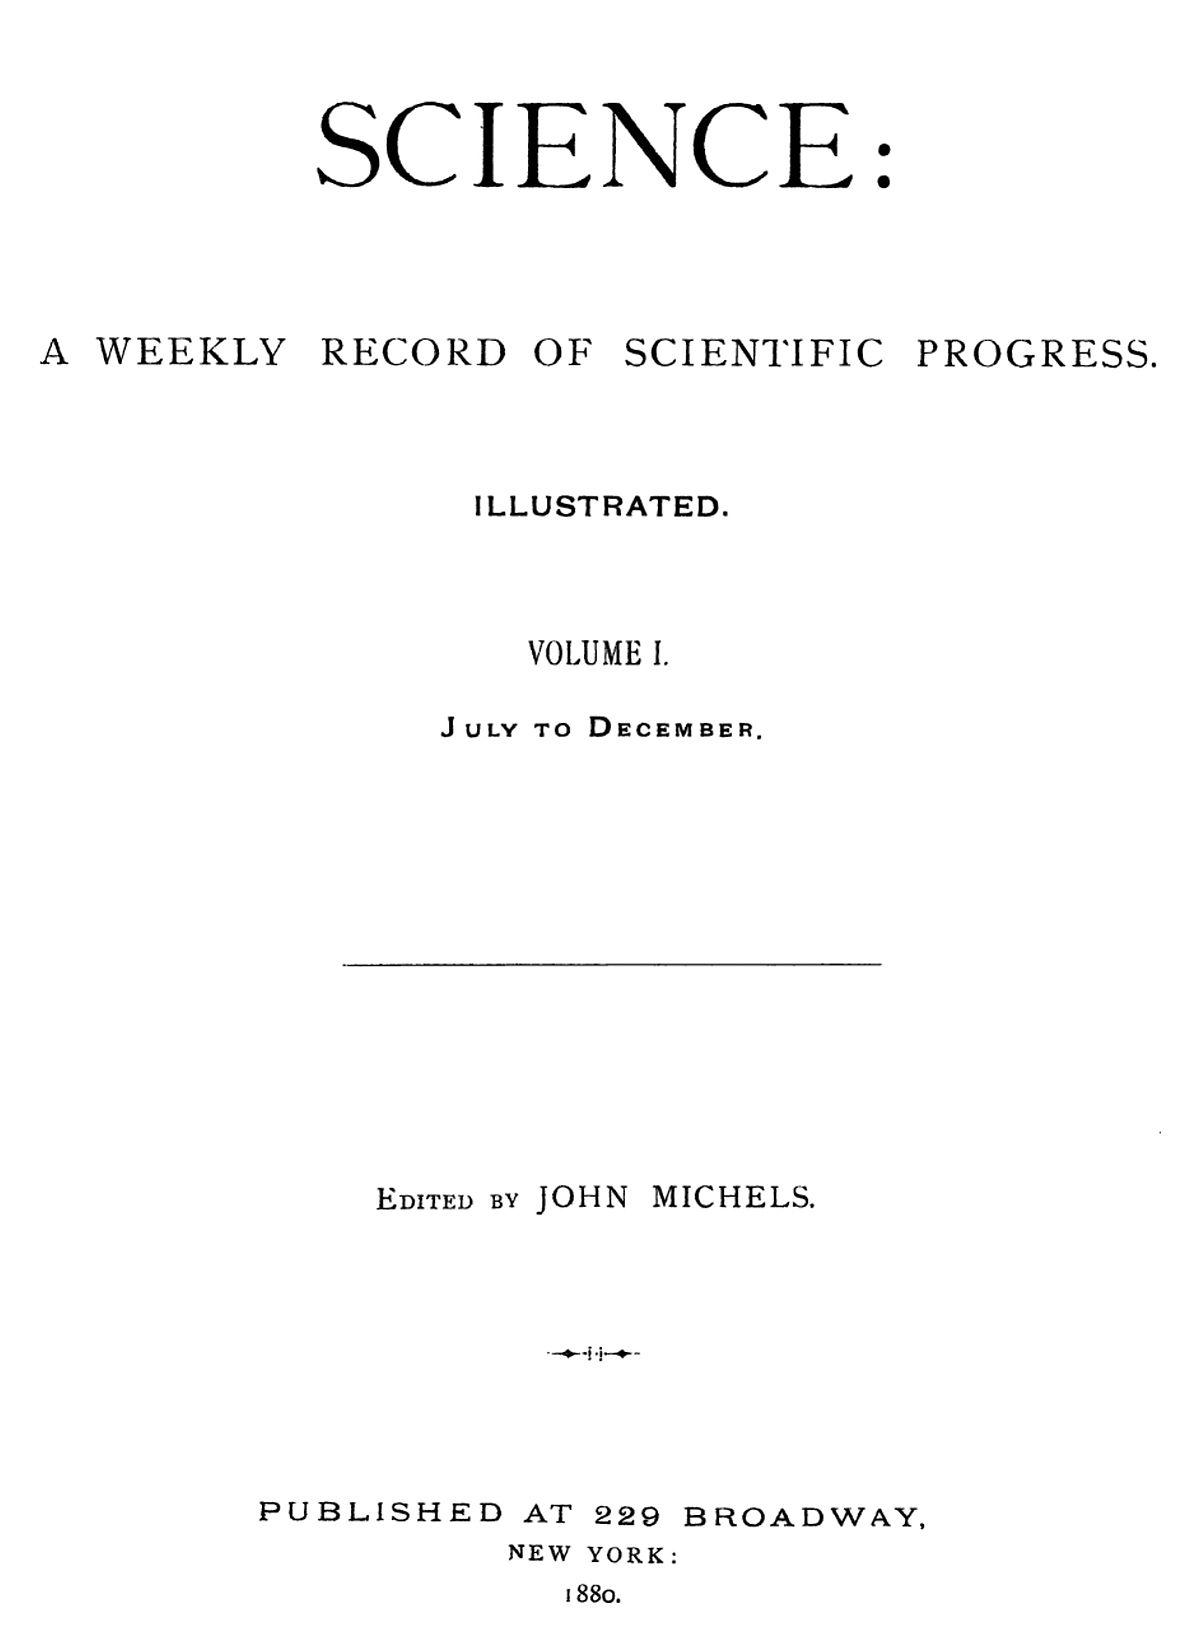 Science Journal Wikipedia